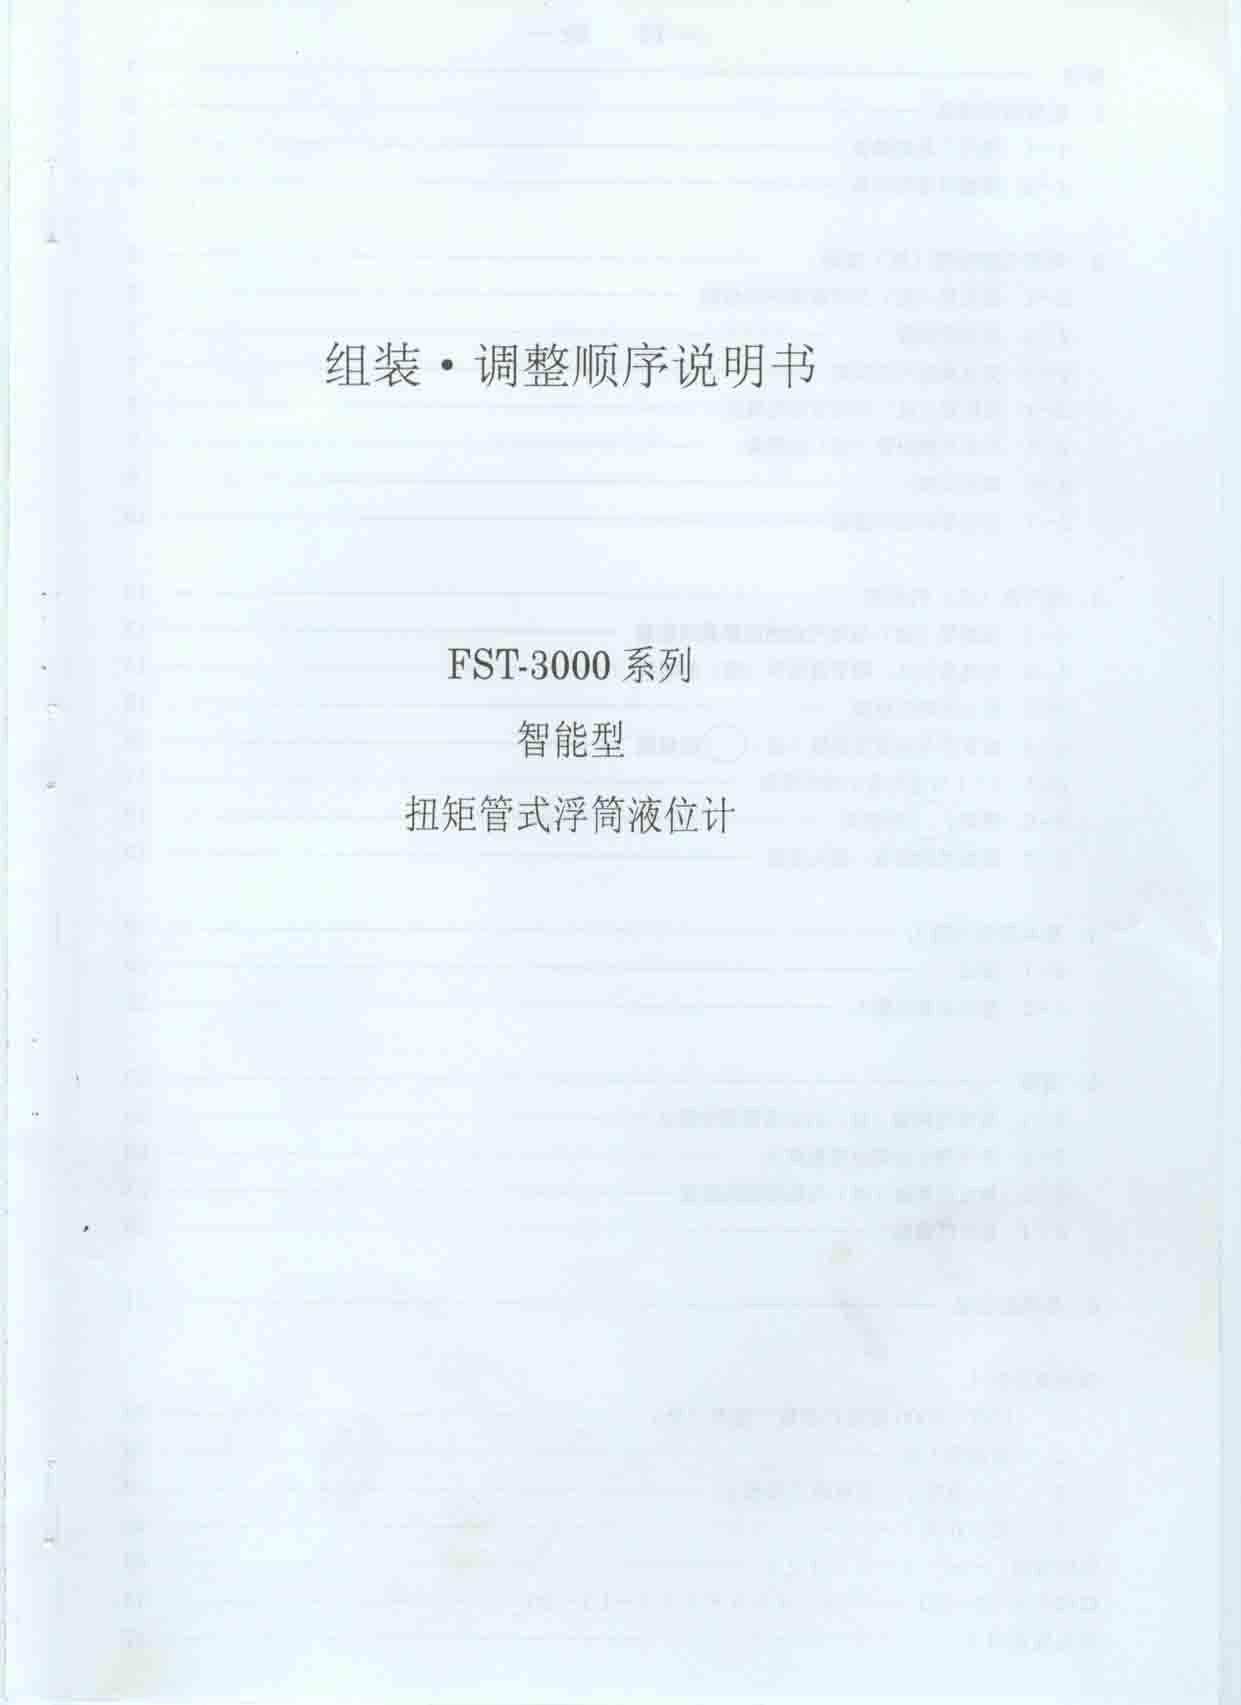 FST调试手册